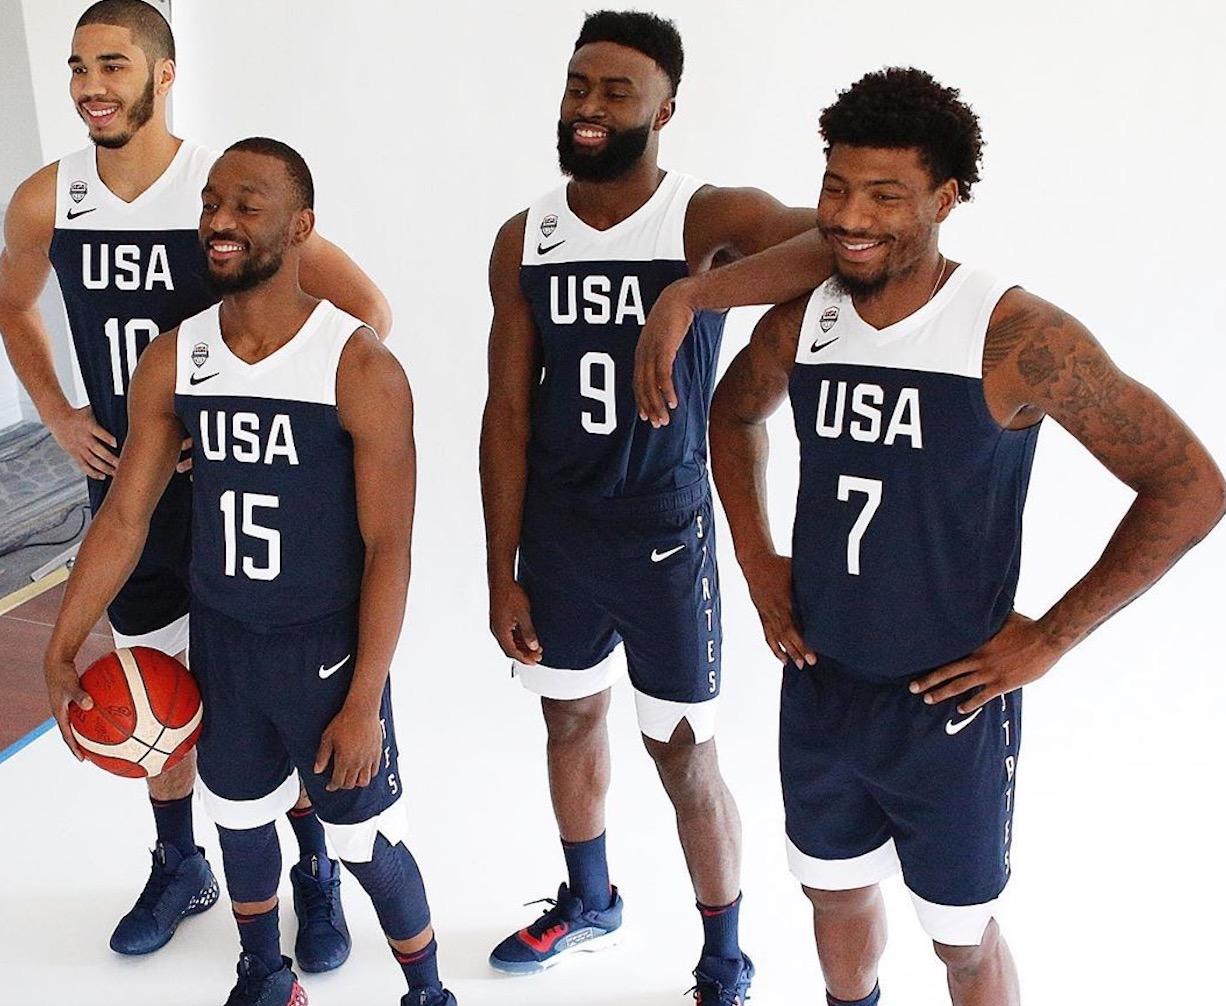 NBA官方今日晒出美国男篮国家队定妆照幕后花絮组图